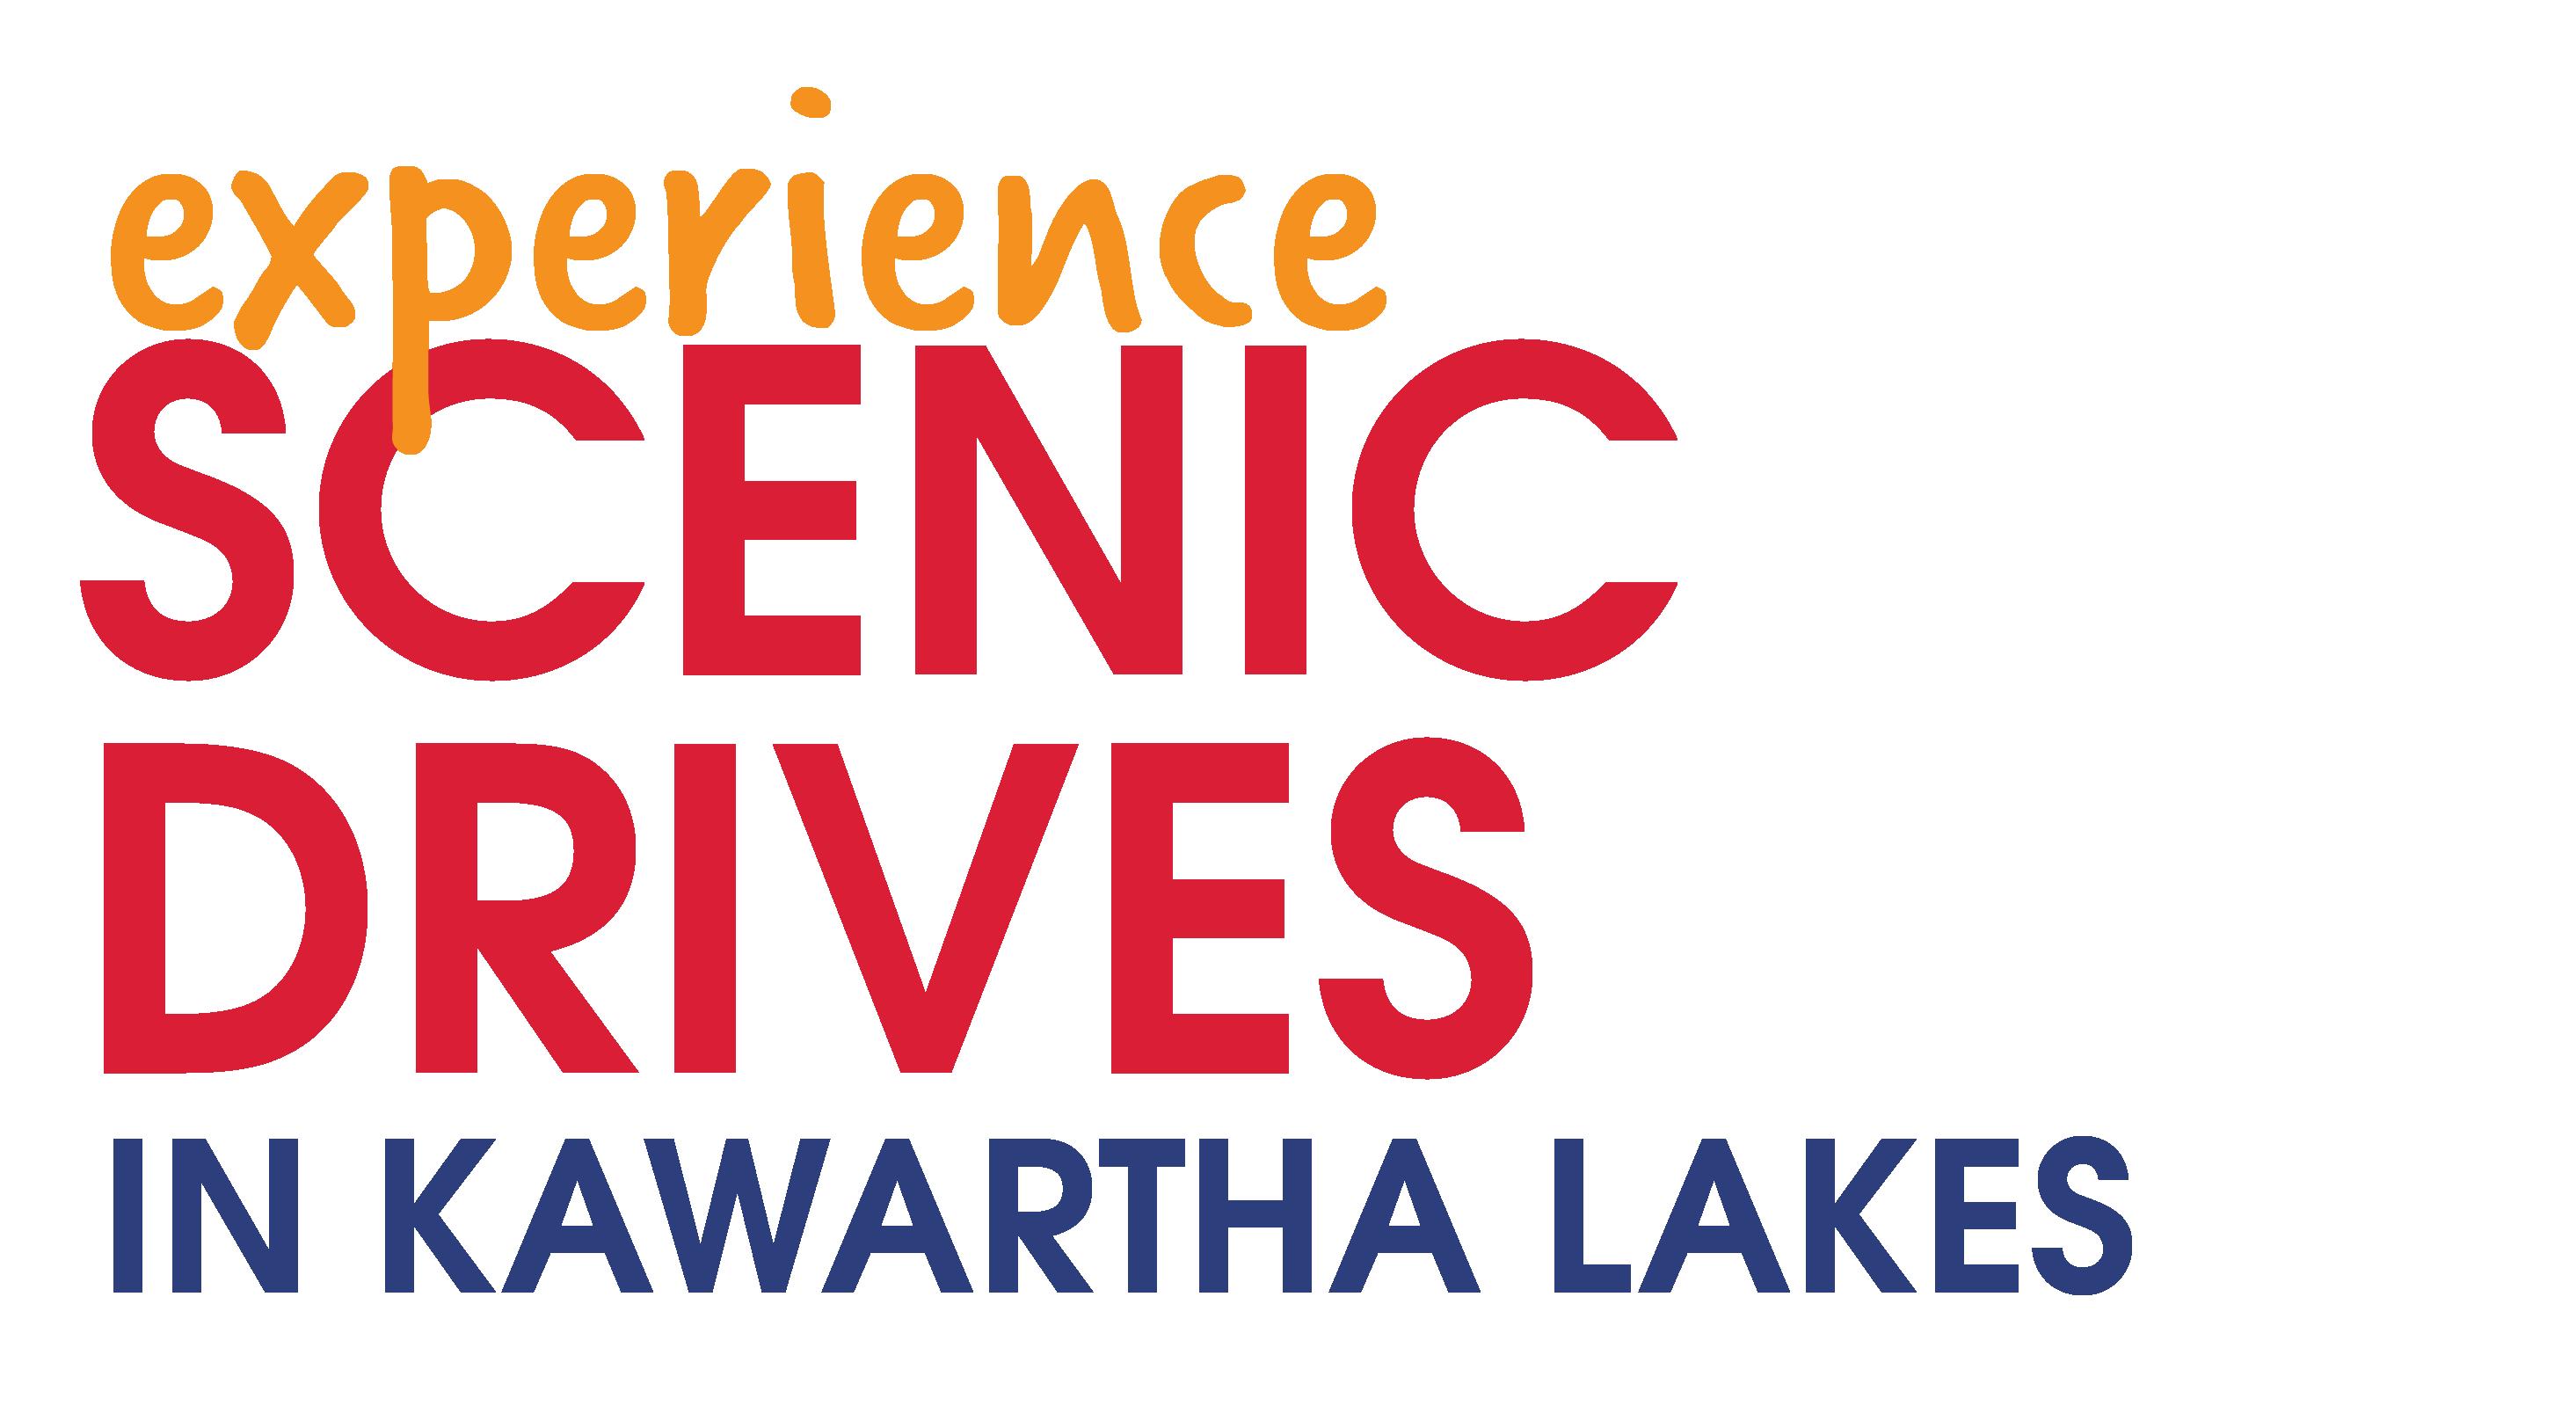 Experience Scenic Drives in Kawartha Lakes